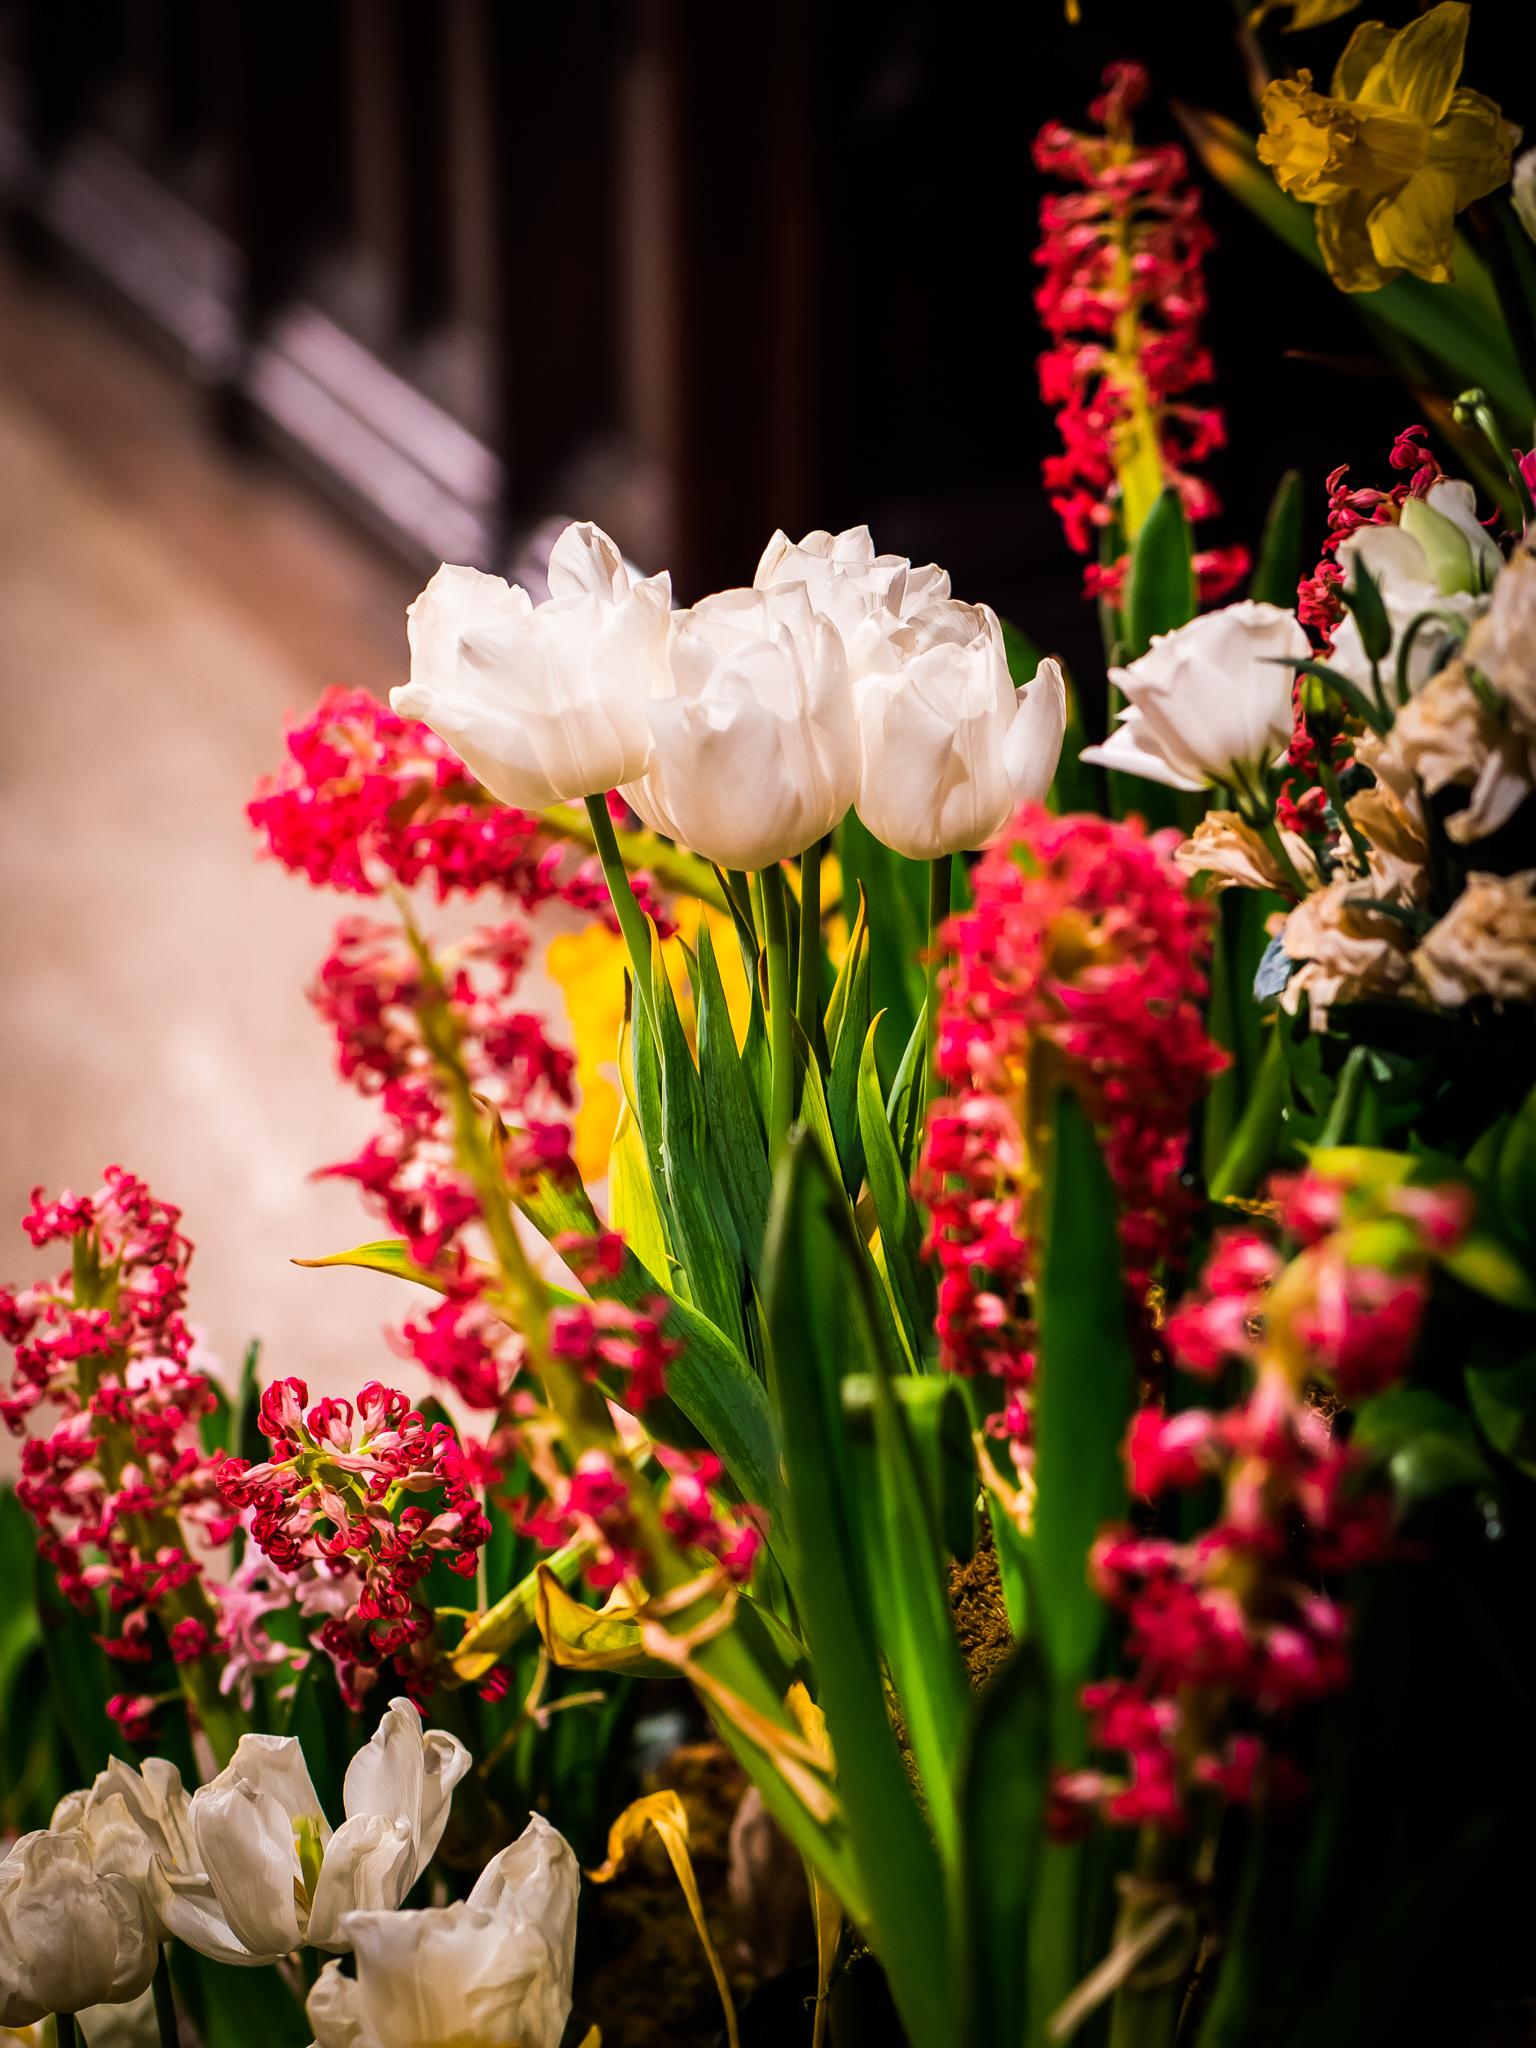 The Flowers of Saint Mary's  Photo by Ricardo Gomez